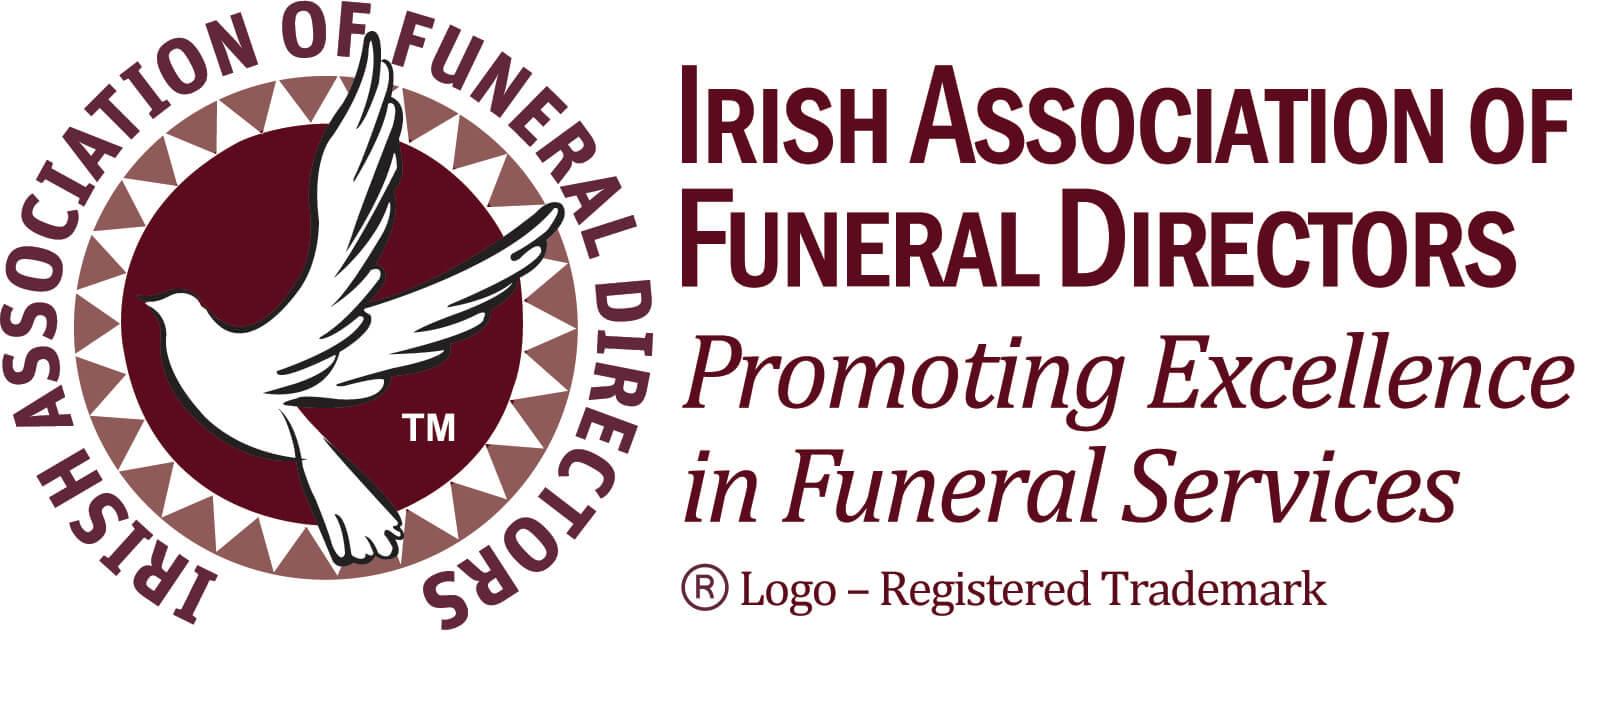 fitzgerald-funeral-main-logo